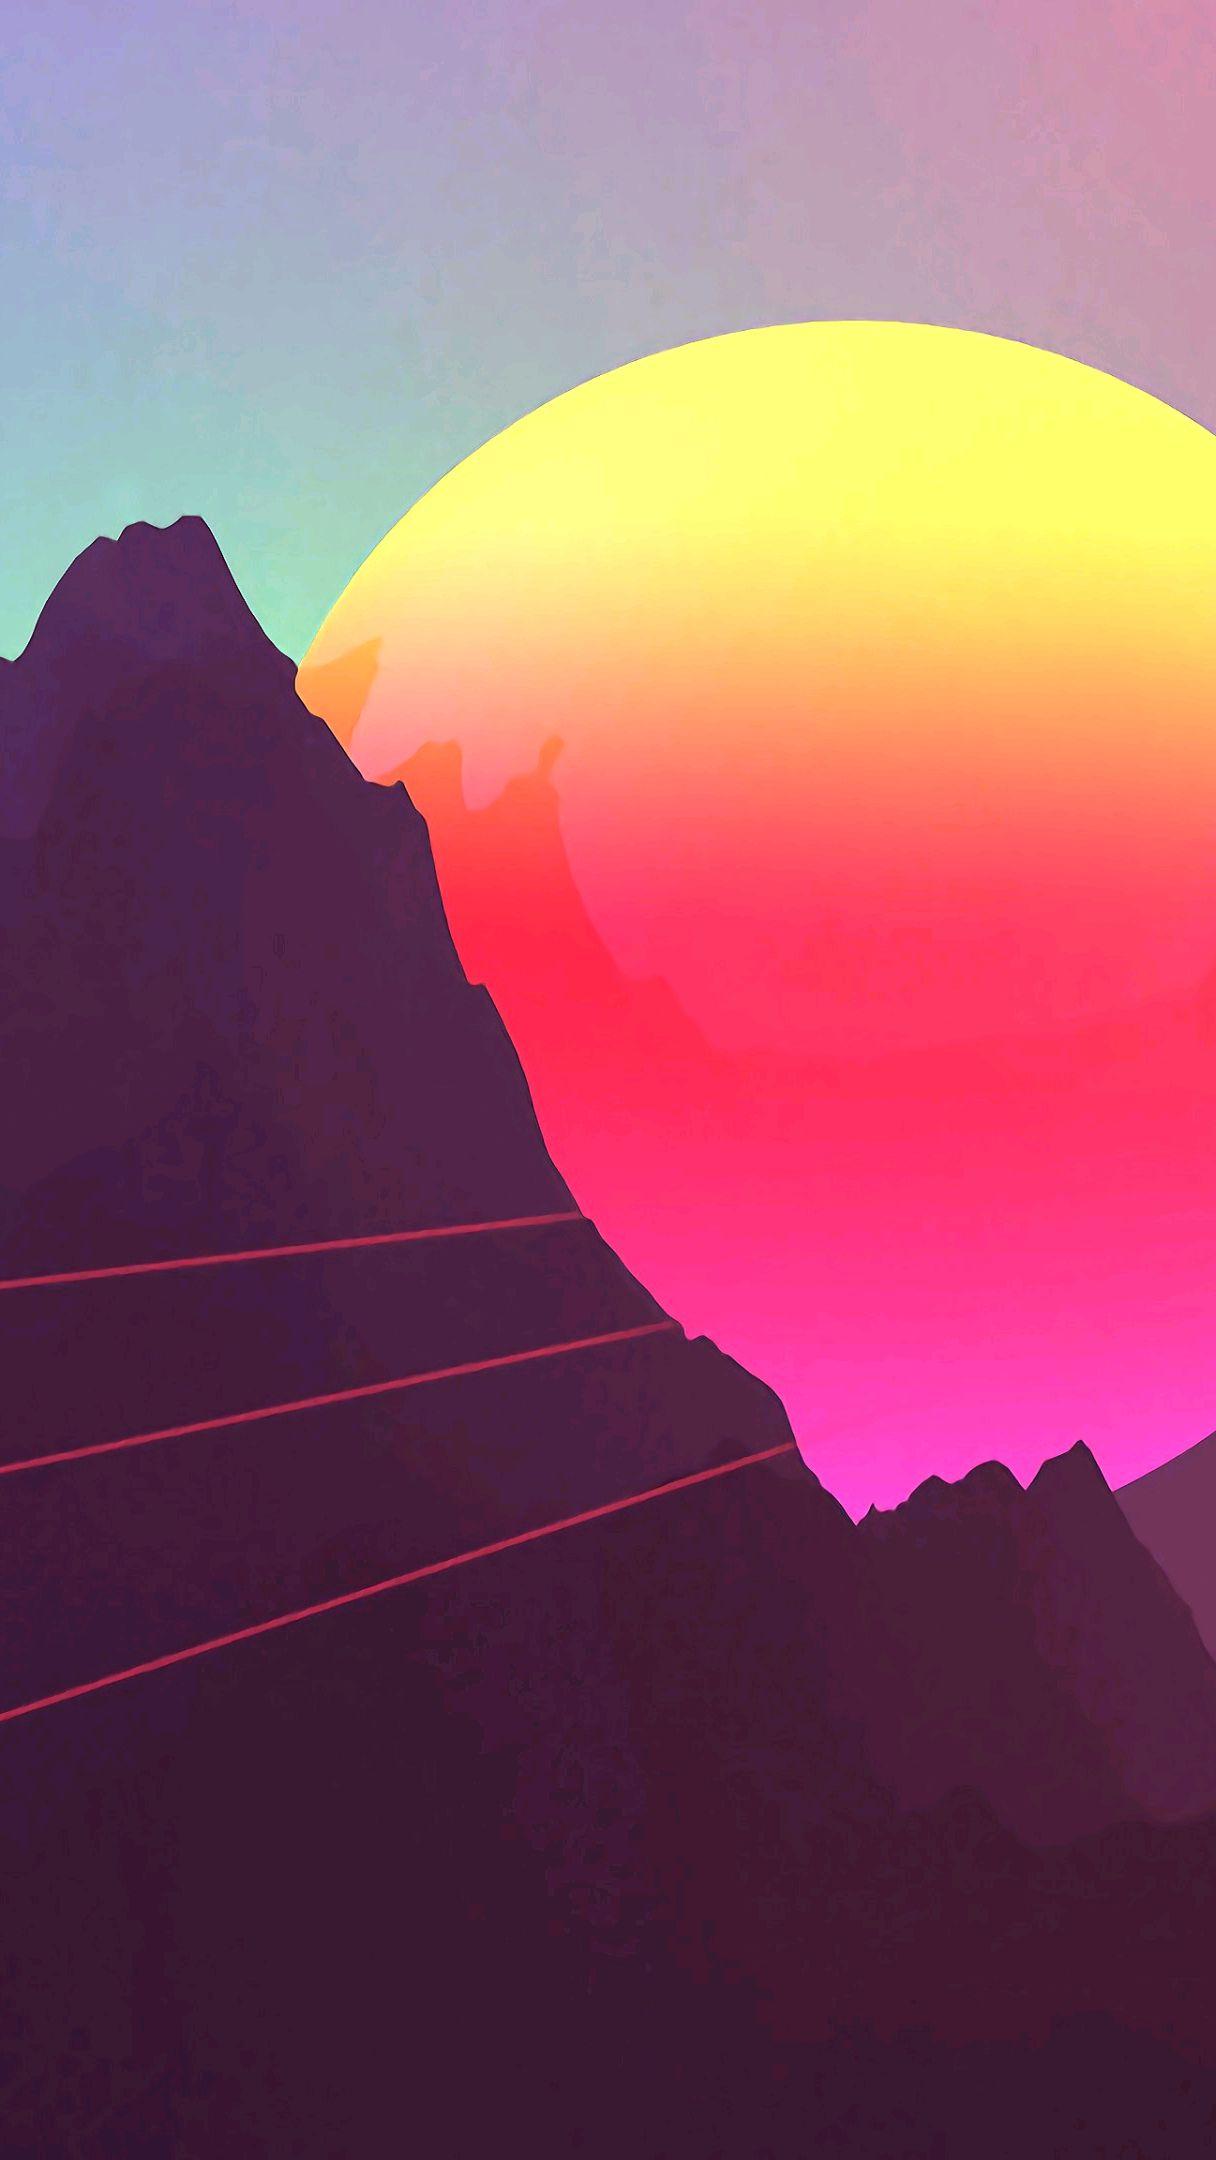 Digital Sunset Mountain iPhone Wallpaper